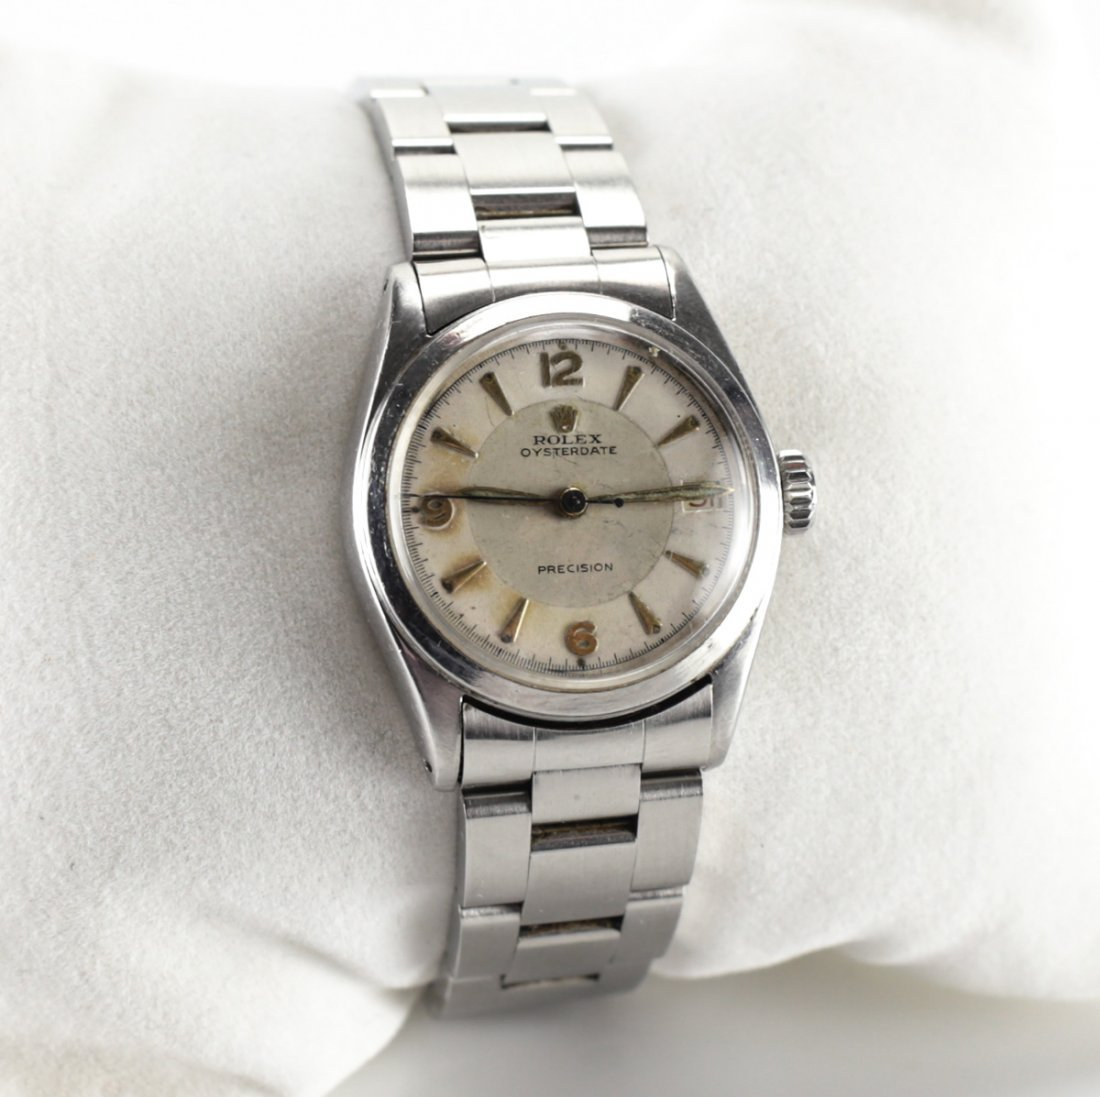 Rolex Stainless Steel Oysterdate Precision Watch